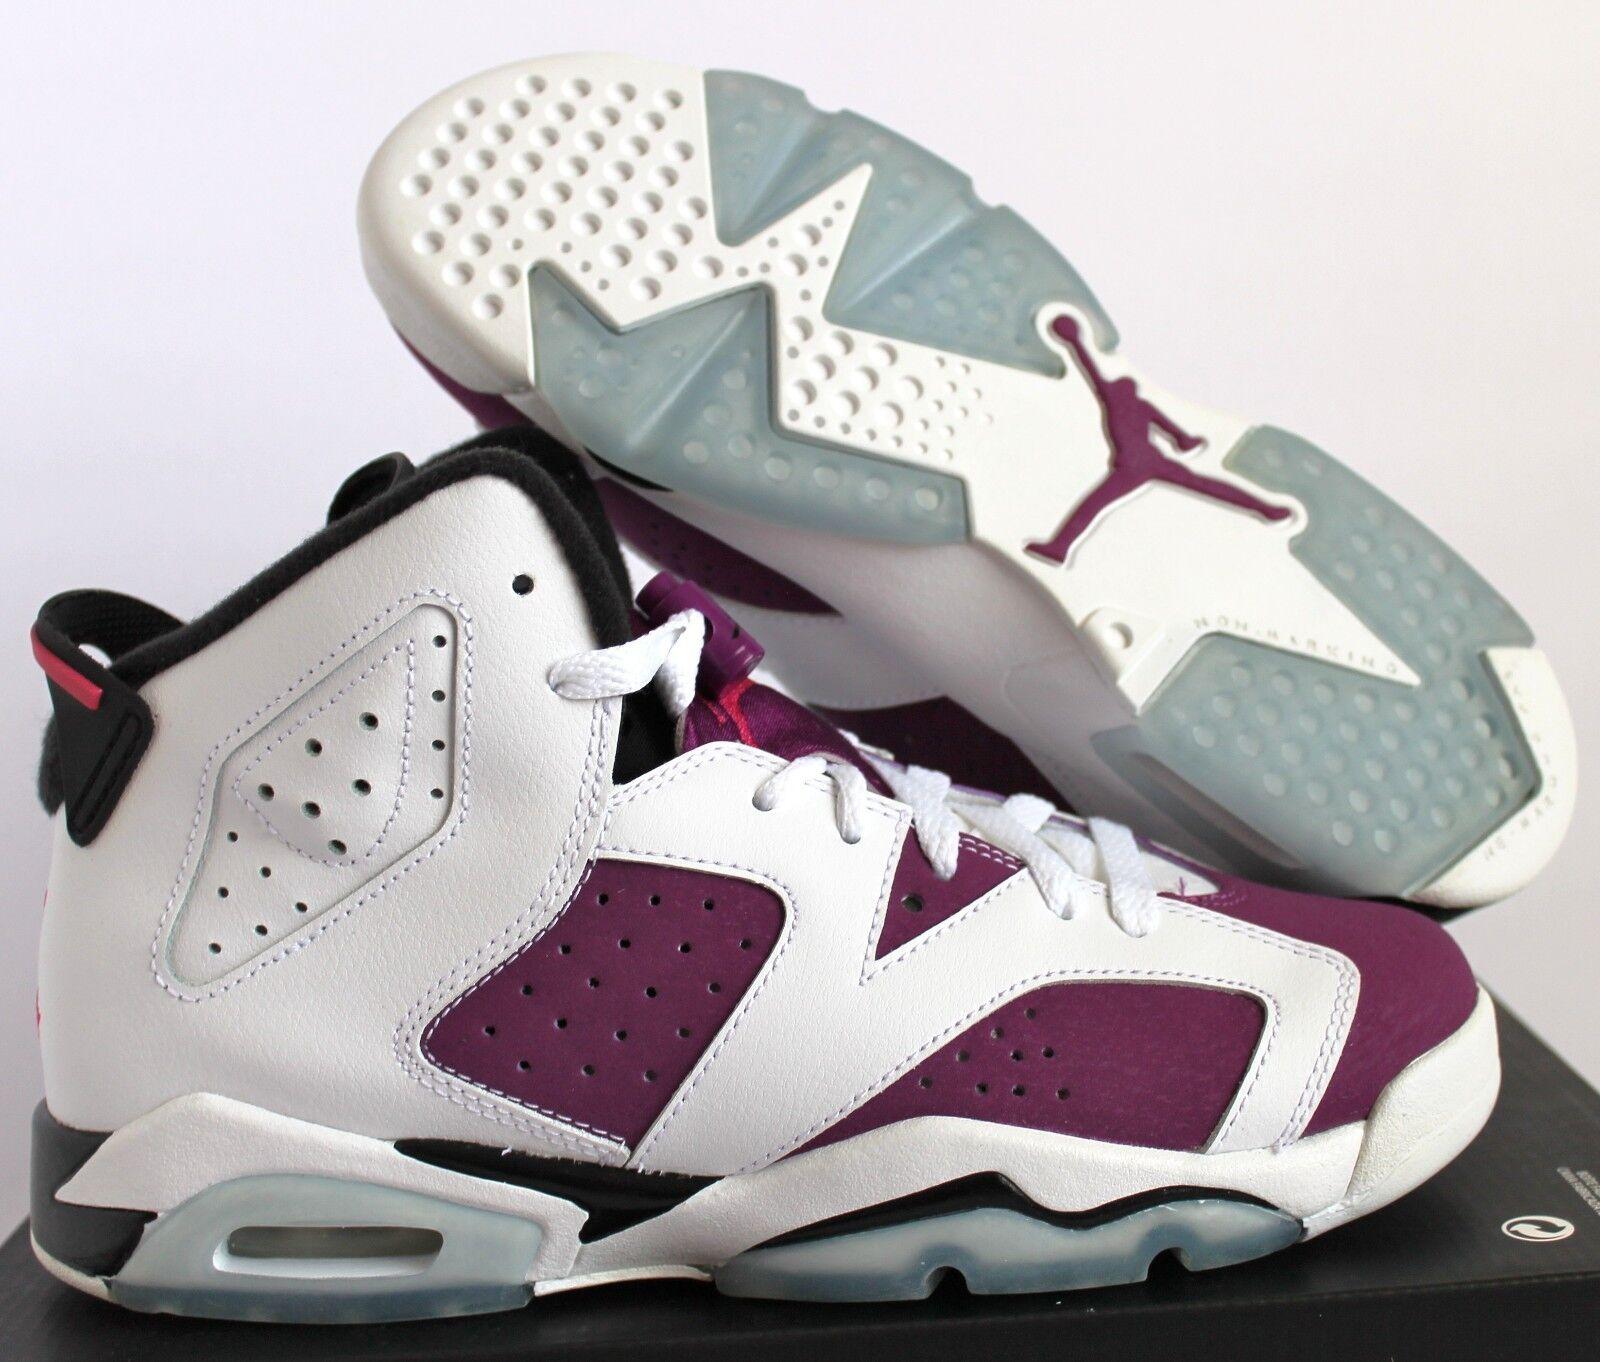 Nike Air Jordan 6 tamaño Retro Gg Blanco-vivos rosa tamaño 6 7Y-Para Mujer [543390-127] 2dfc54